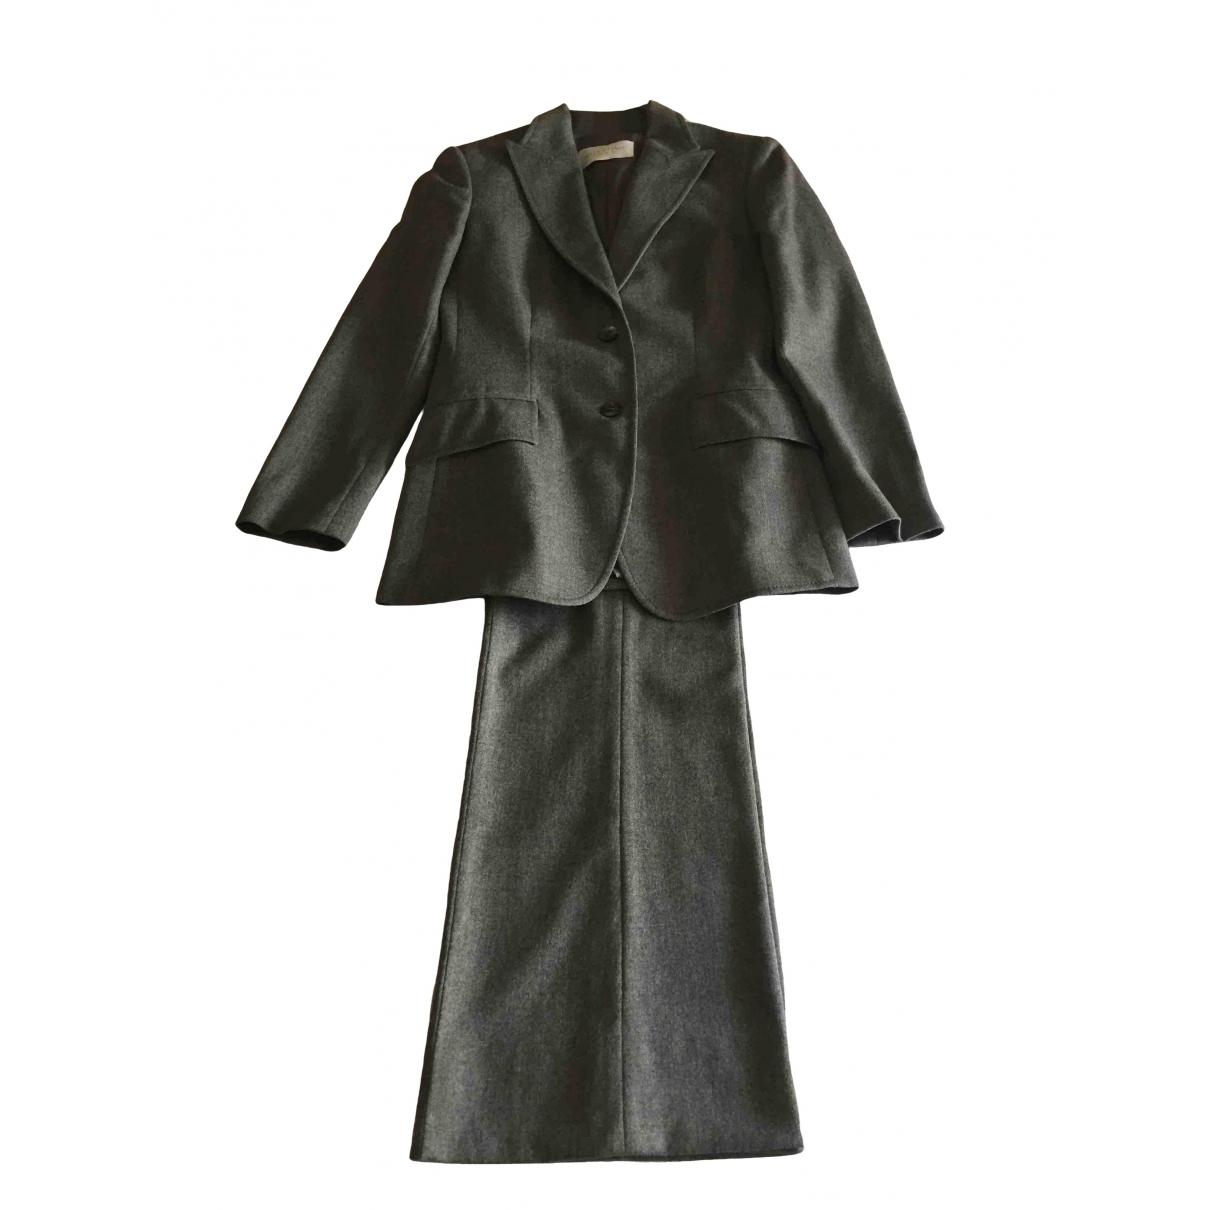 Valentino Garavani \N Grey Wool jacket for Women 40 IT